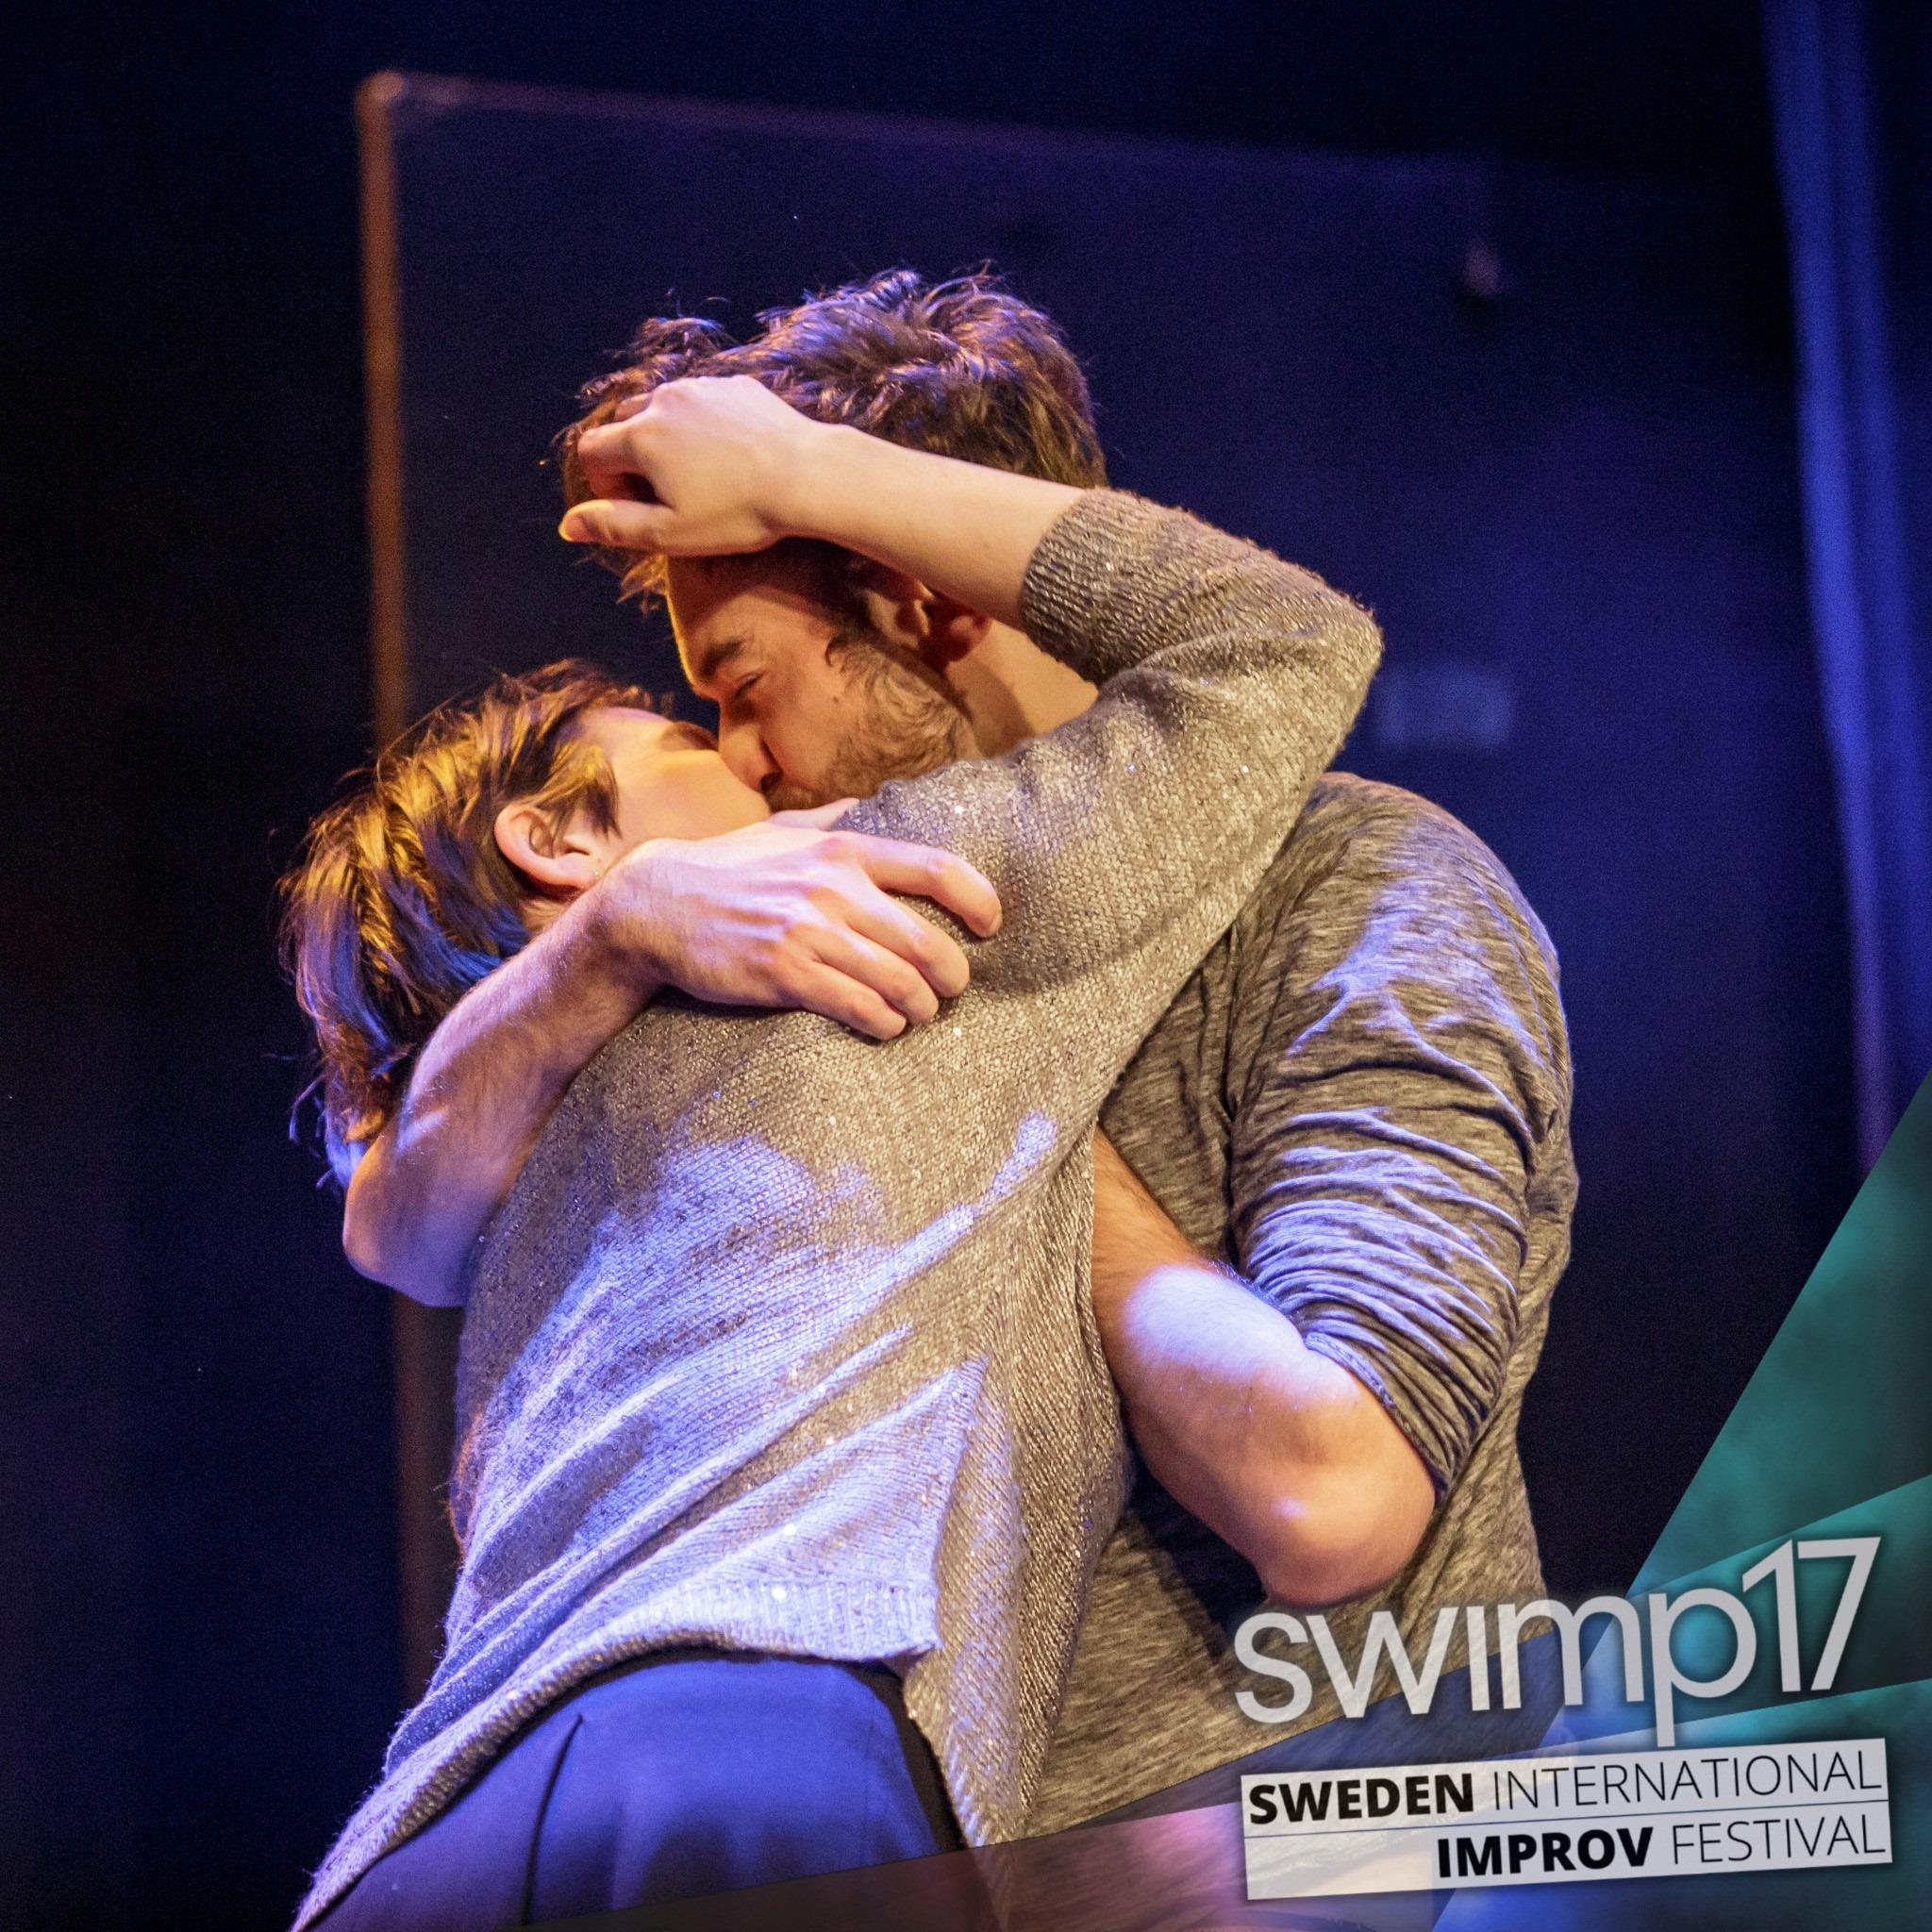 Improbanden 'Secret Confessions' at SWIMP17